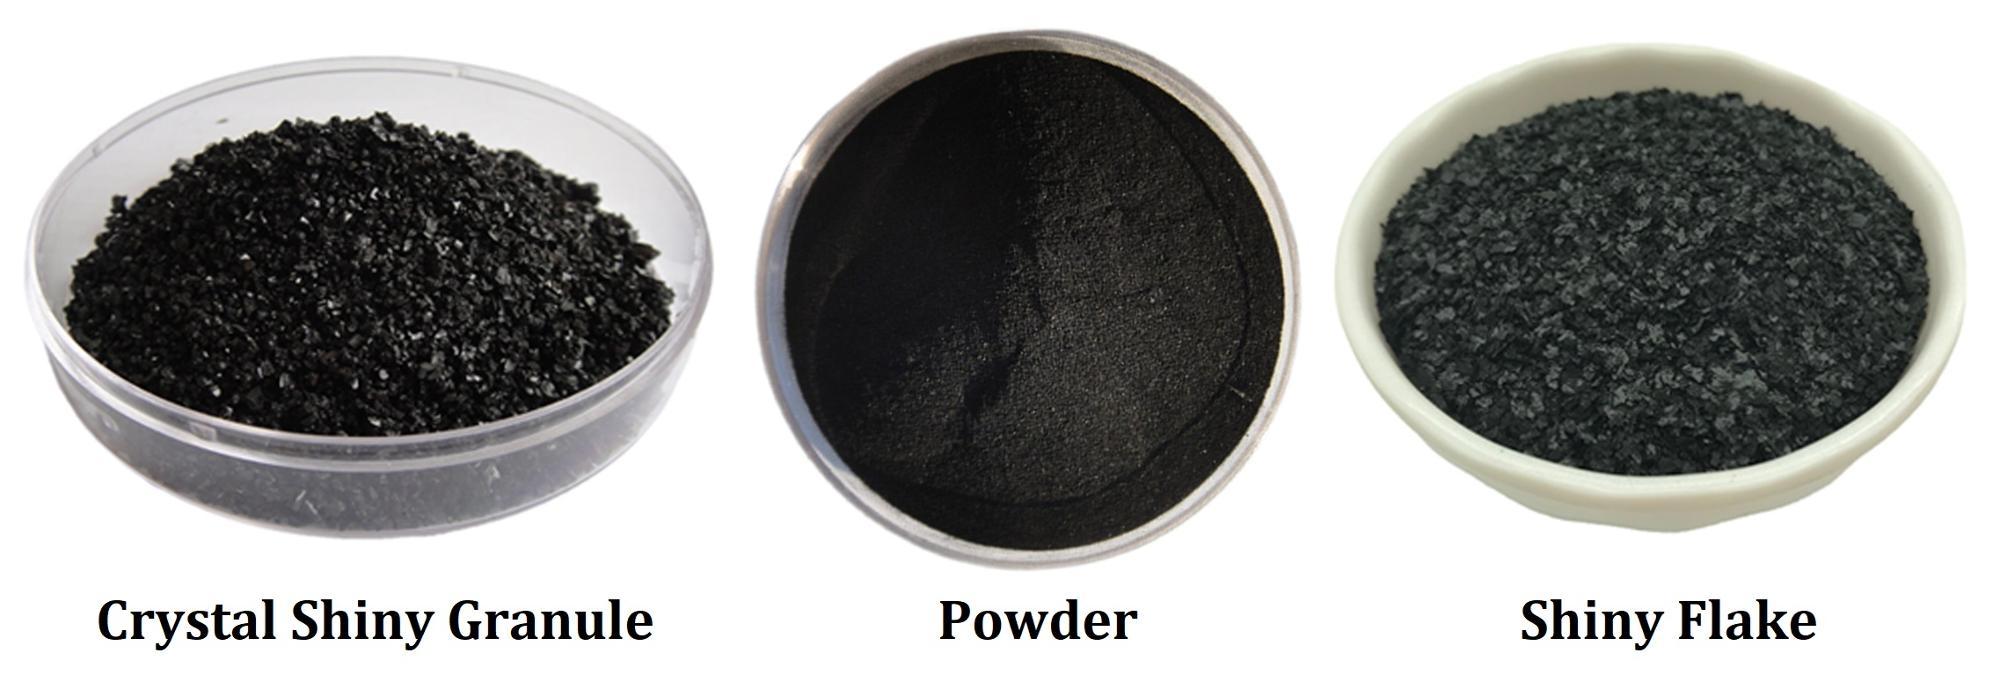 EVEREST Optimum Plant Growth Potassium Humate Humic Fulvic Acid Organic Fertilizer Humus